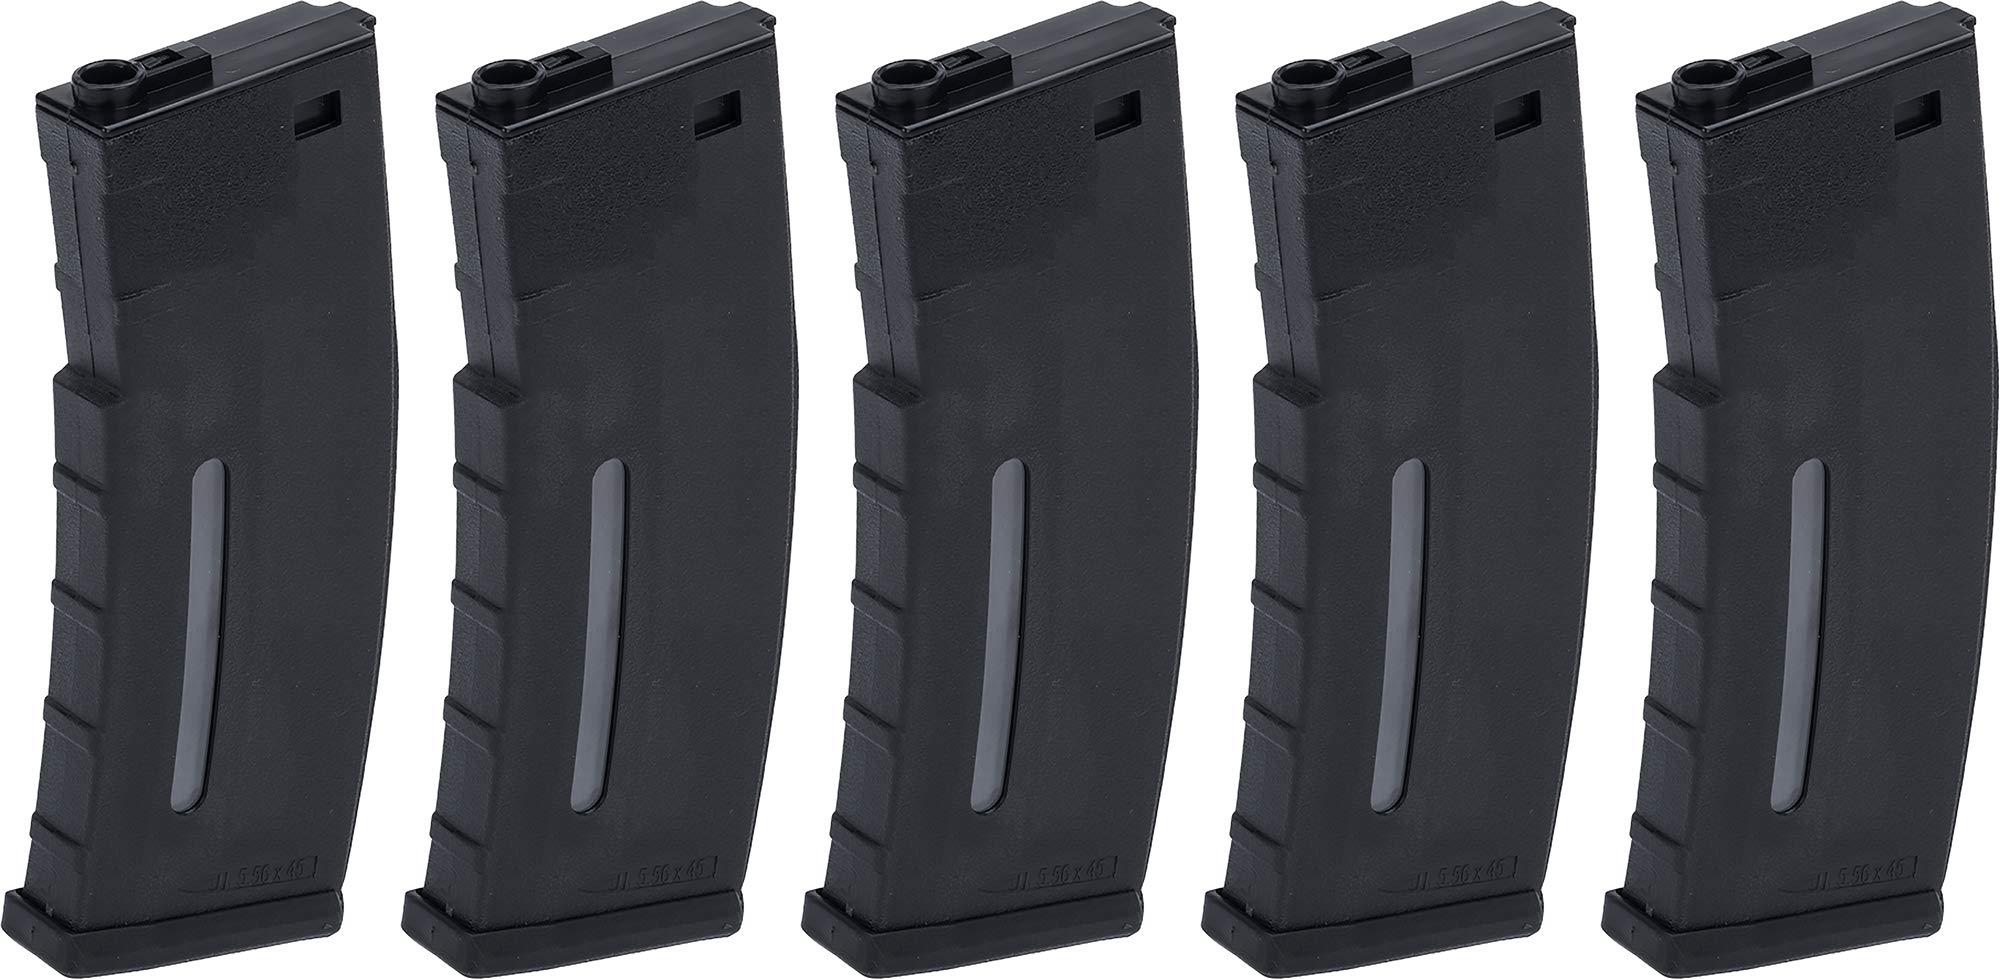 Evike BAMF 30rd Polymer Mil-Sim Airsoft Magazine for M4 / M16 Series AEG Rifles (Color: Black / x5 Package) by Evike